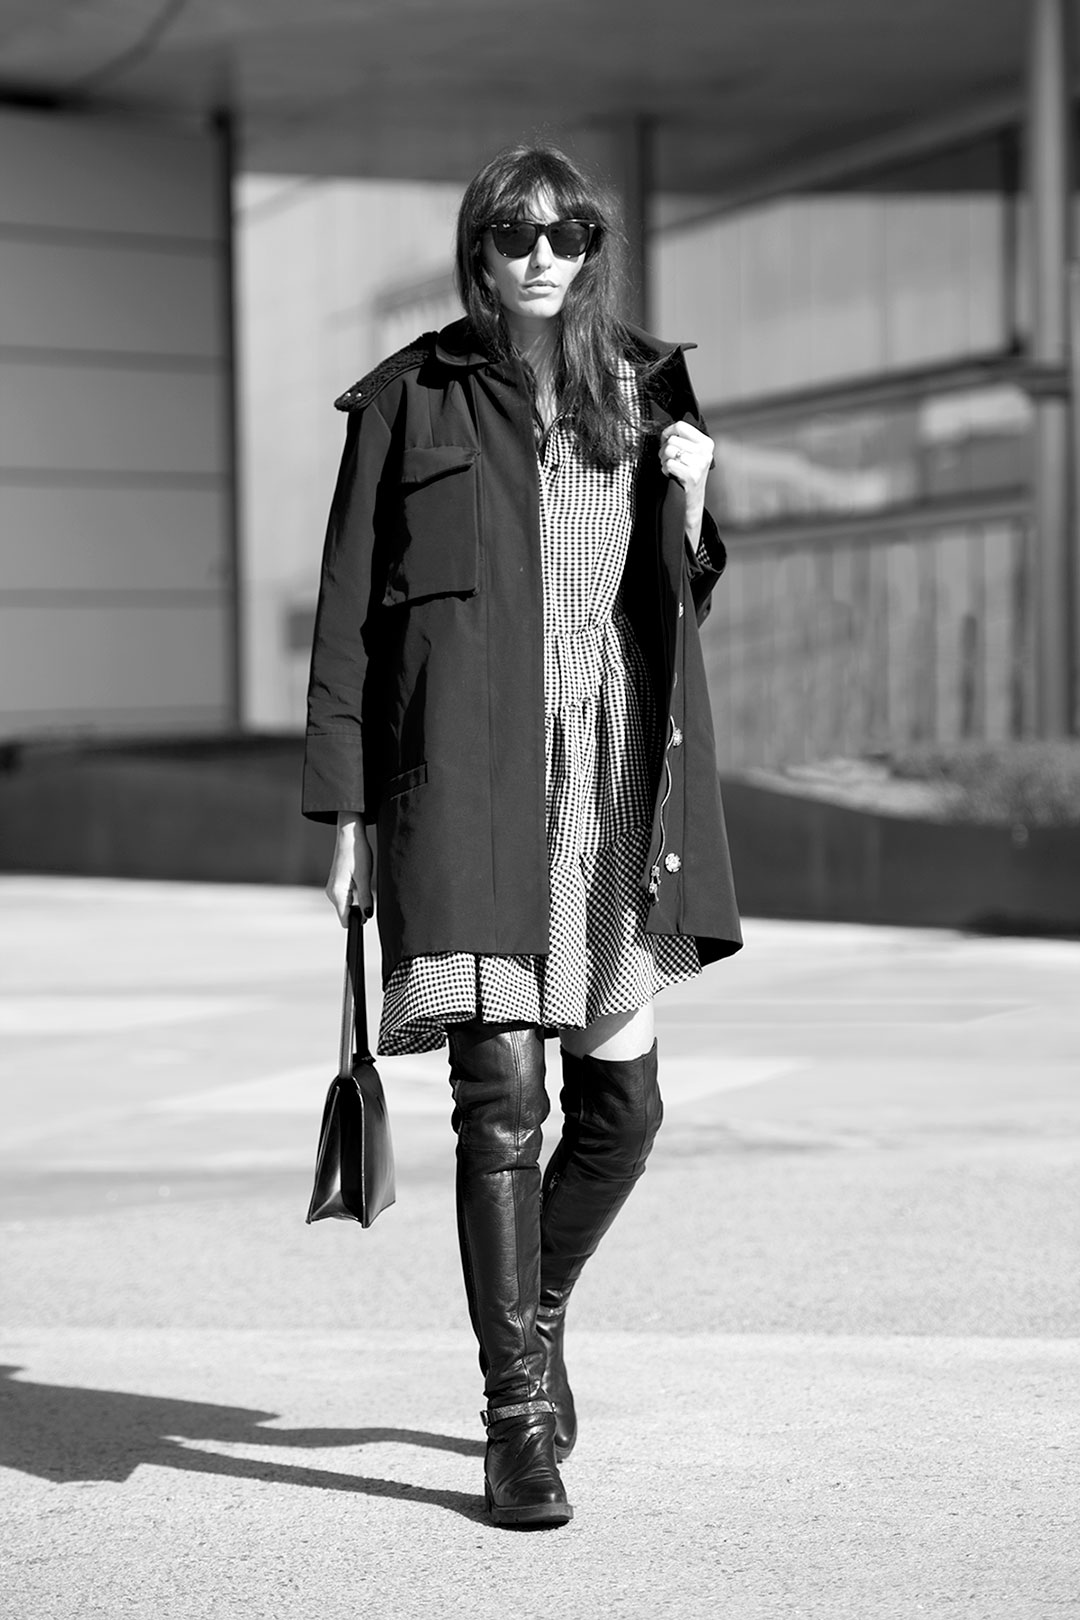 mbfwm-black-and-white-street-style-mitmeblog-bn-web-06